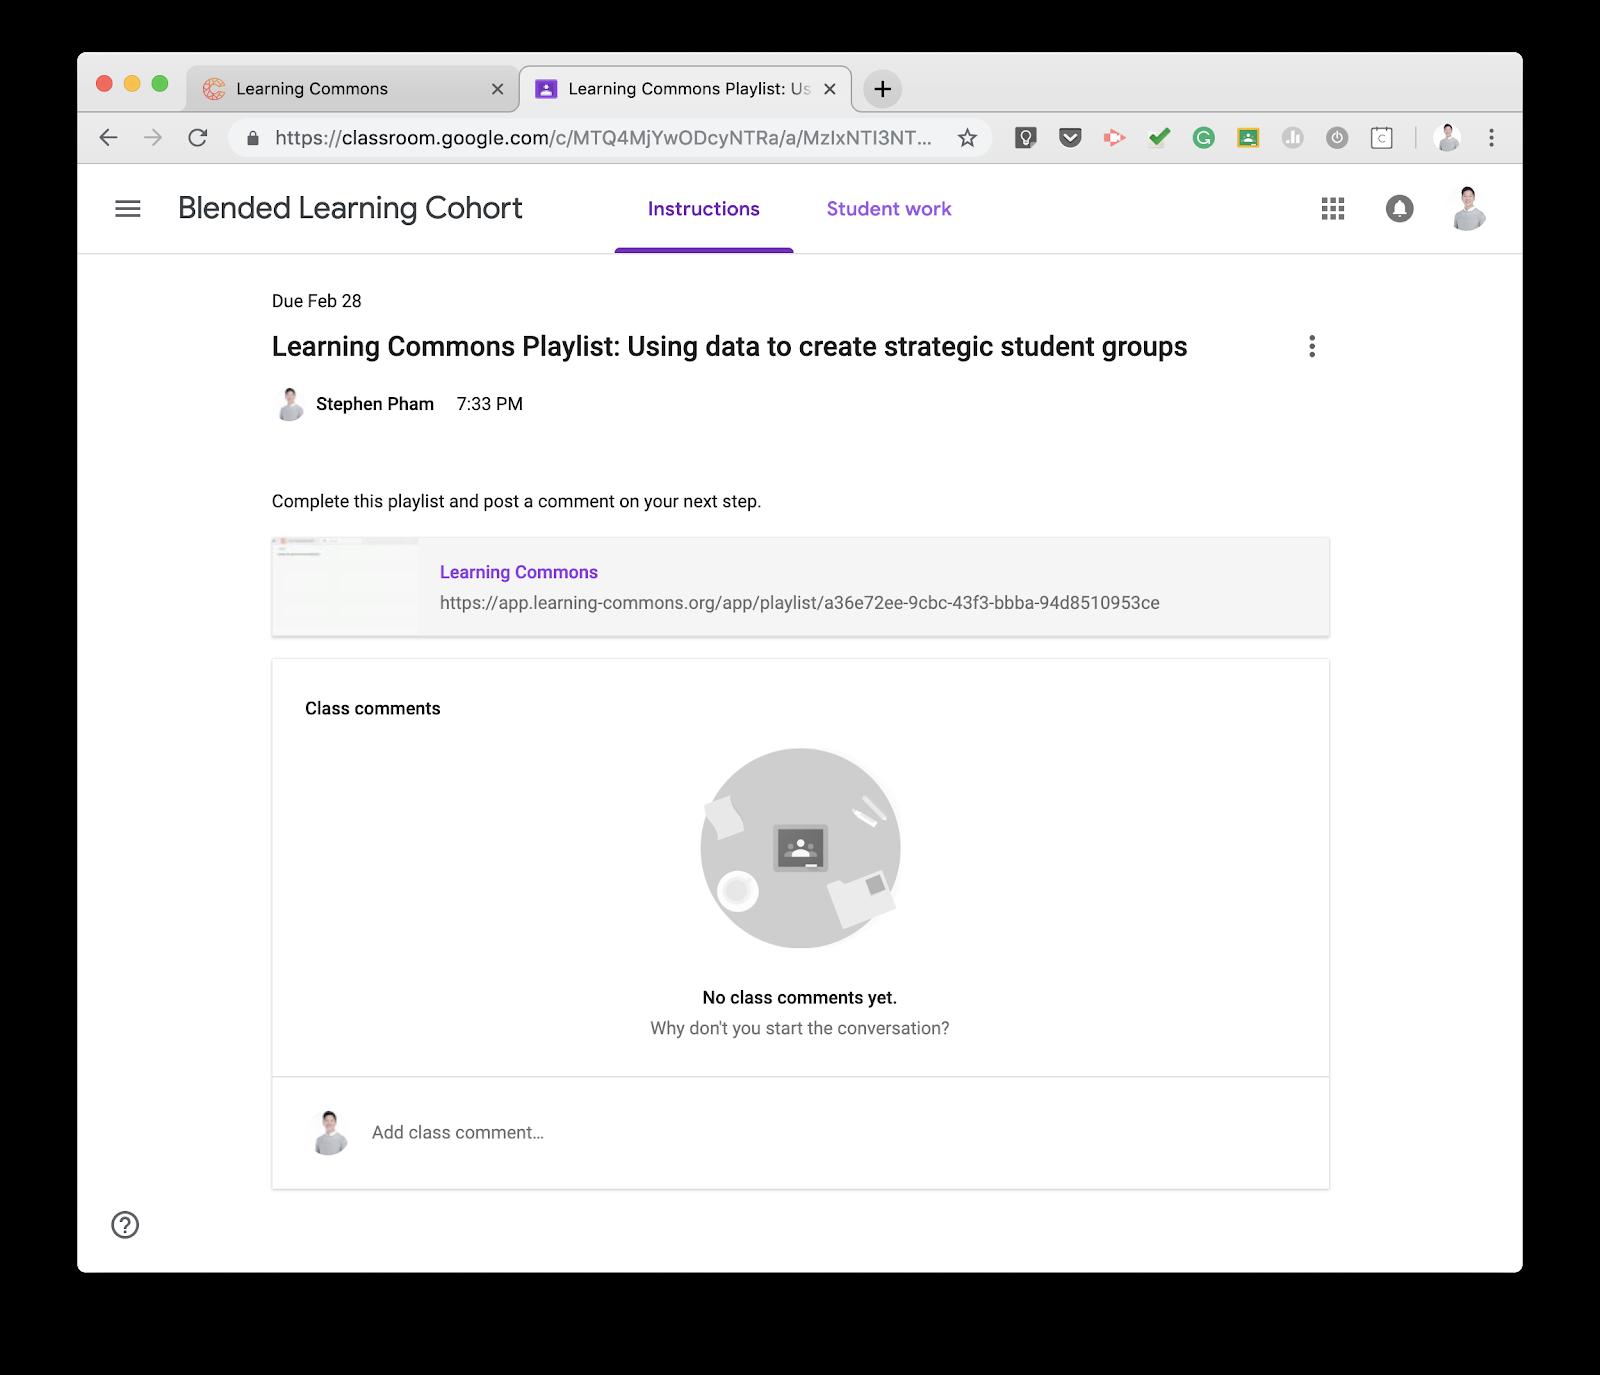 GoogleShare3.png